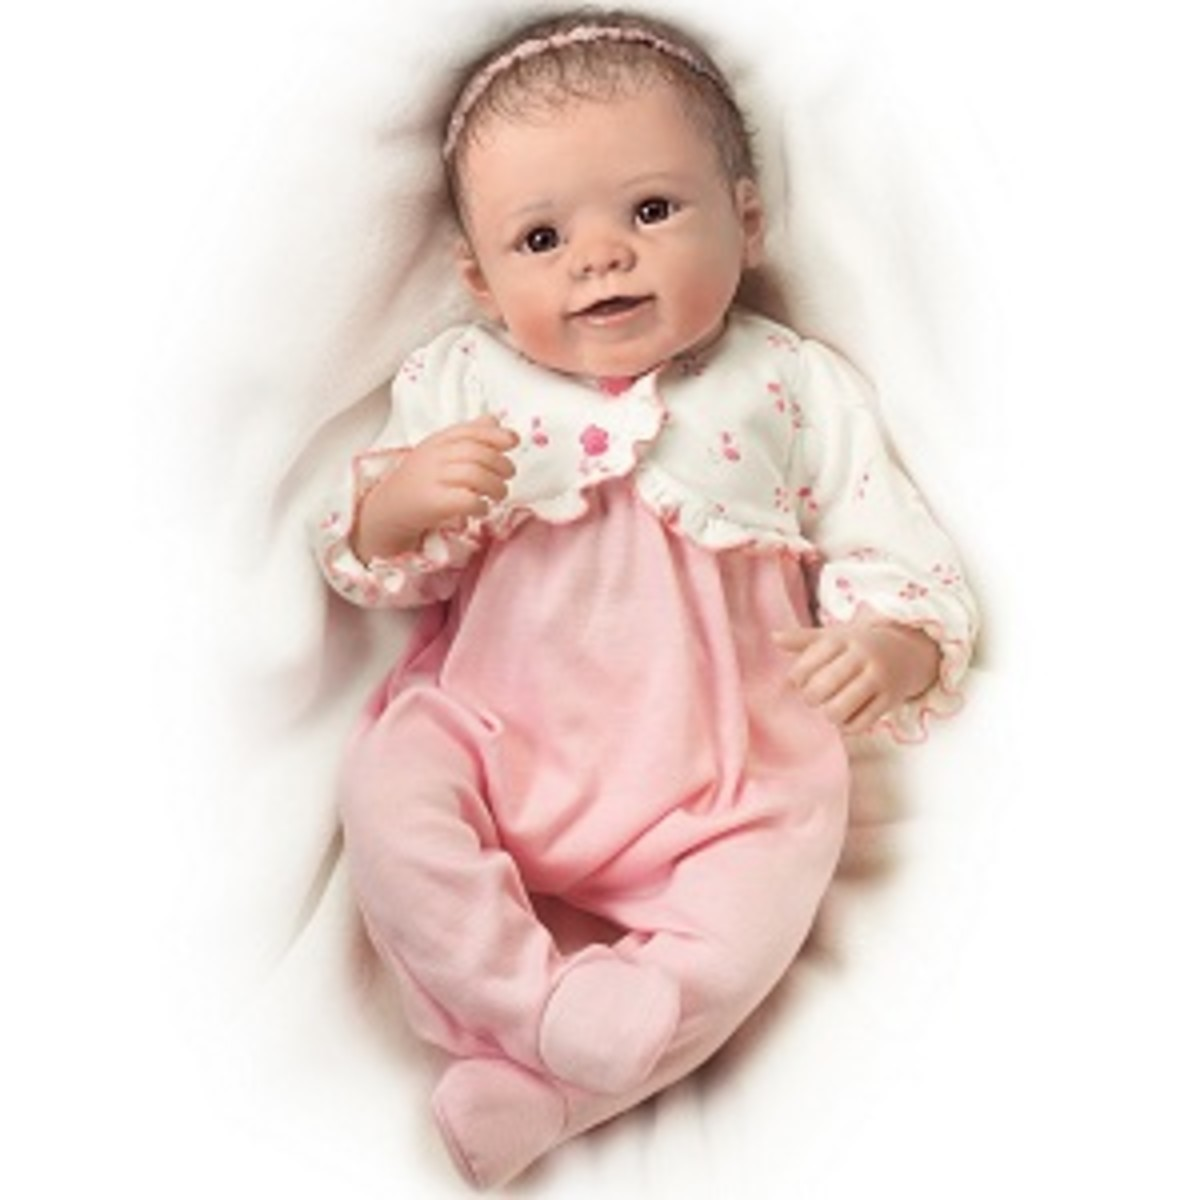 One of many lovable lifelike breathing baby dolls